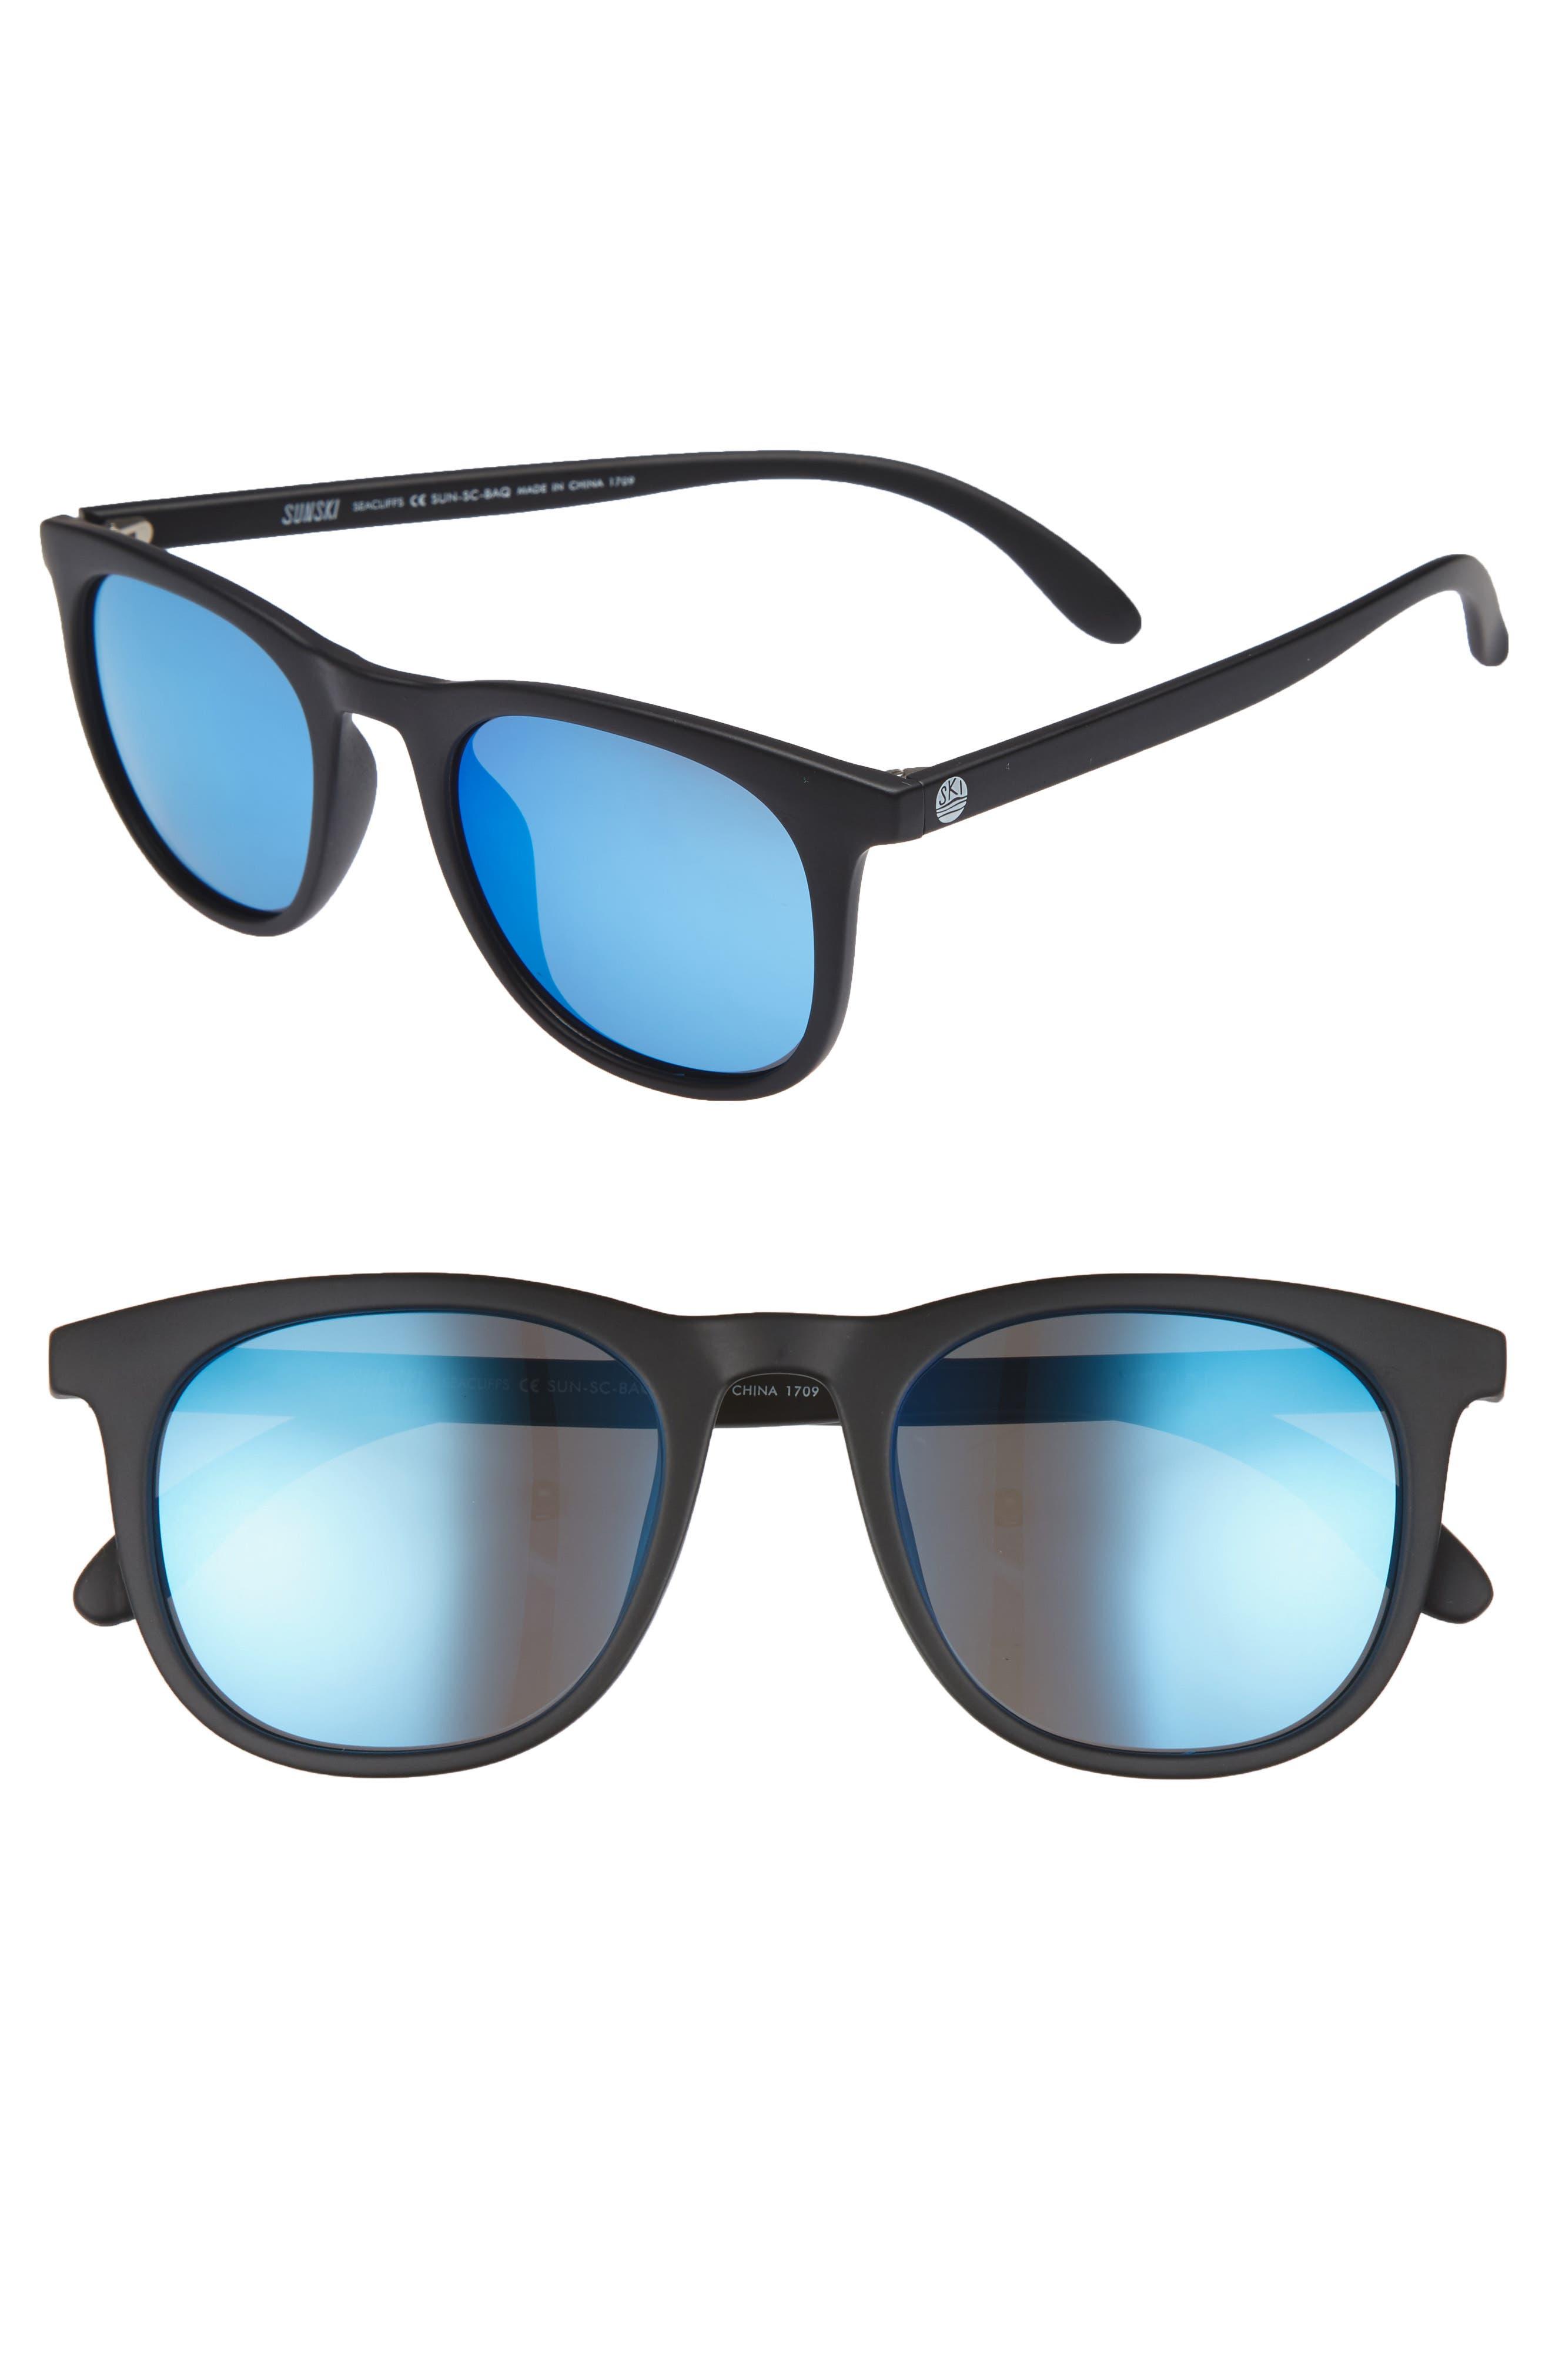 Main Image - Sunski Seacliff 48mm Polarized Sunglasses